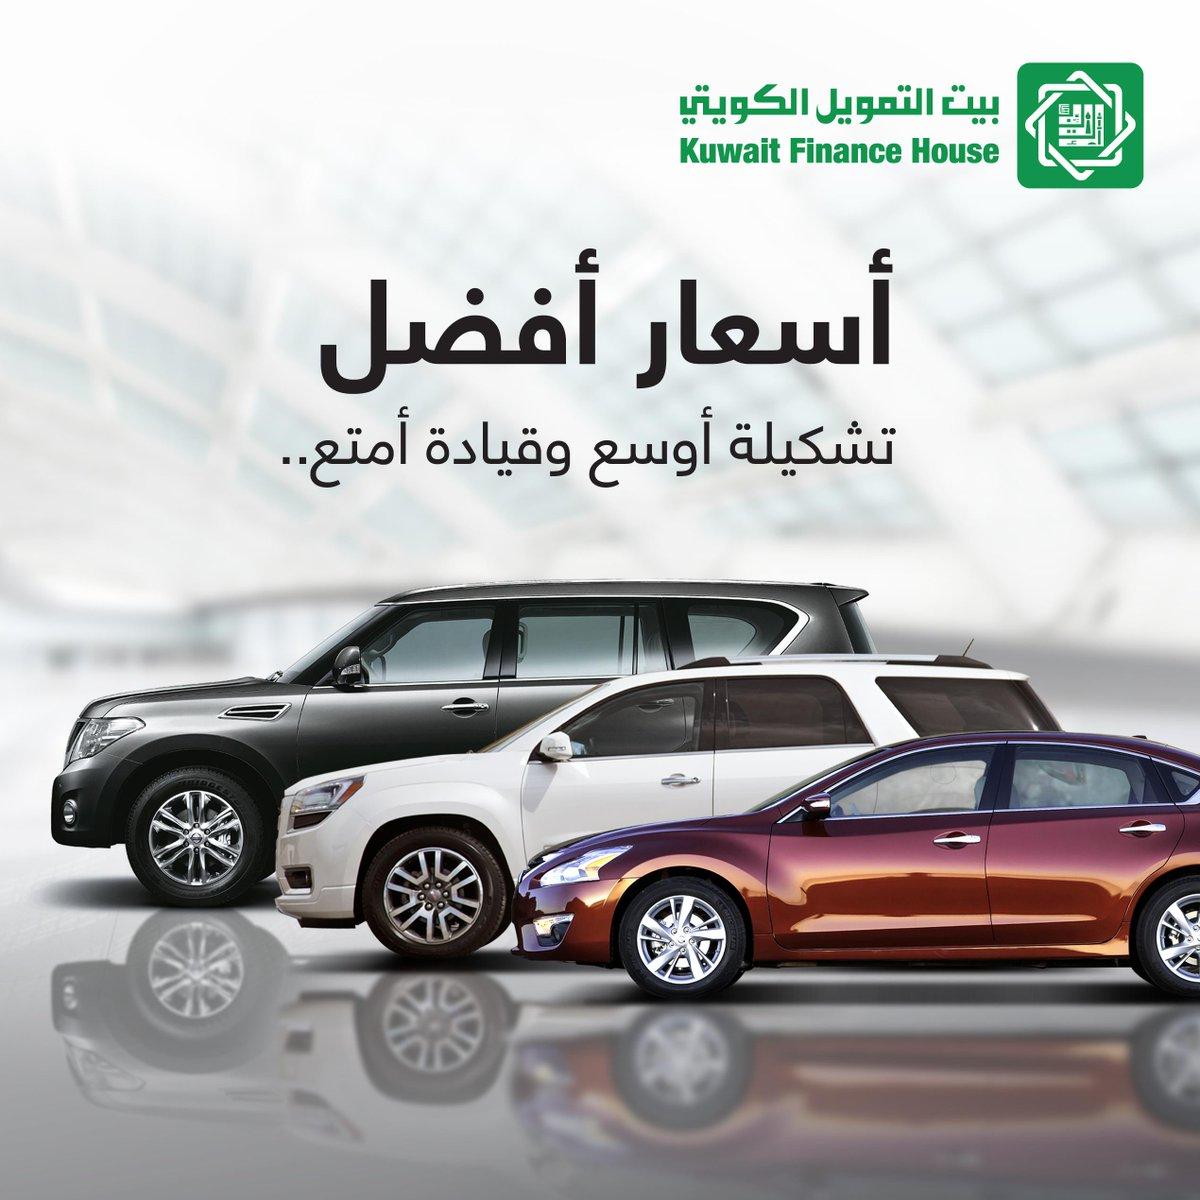 Kuwait Finance House V Twitter S6aam Q8 معارض السيارات